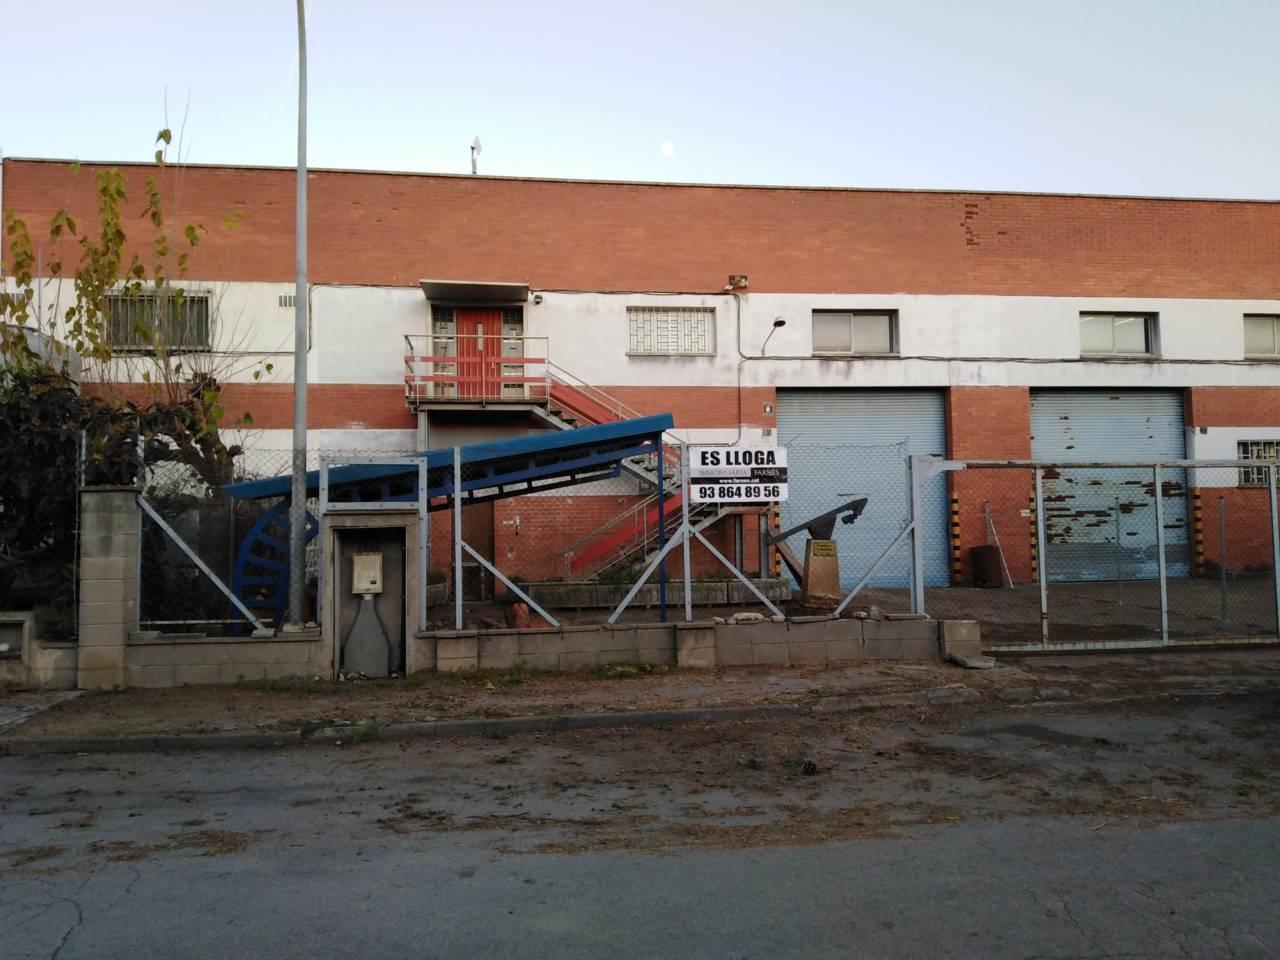 Lloguer Nau industrial  Can cortes. Nave doblada!!!!!!!!!!! superf. 850 m² (450m² de planta + 400m²